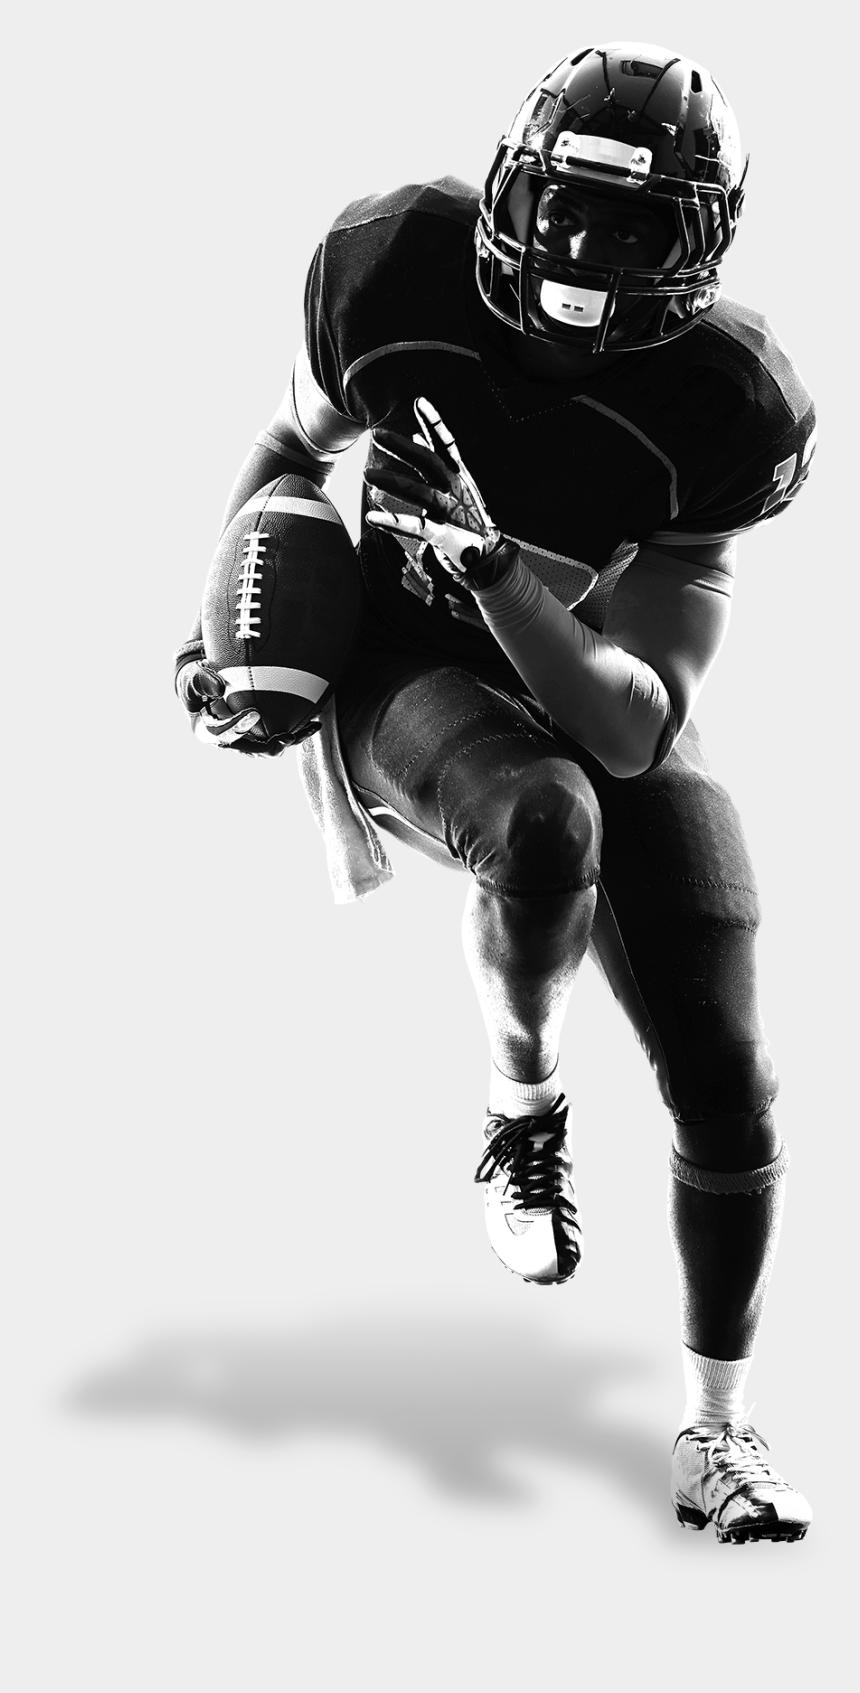 minnesota vikings clipart, Cartoons - Nfl Draft Minnesota Vikings American Football Football - American Football Player Png